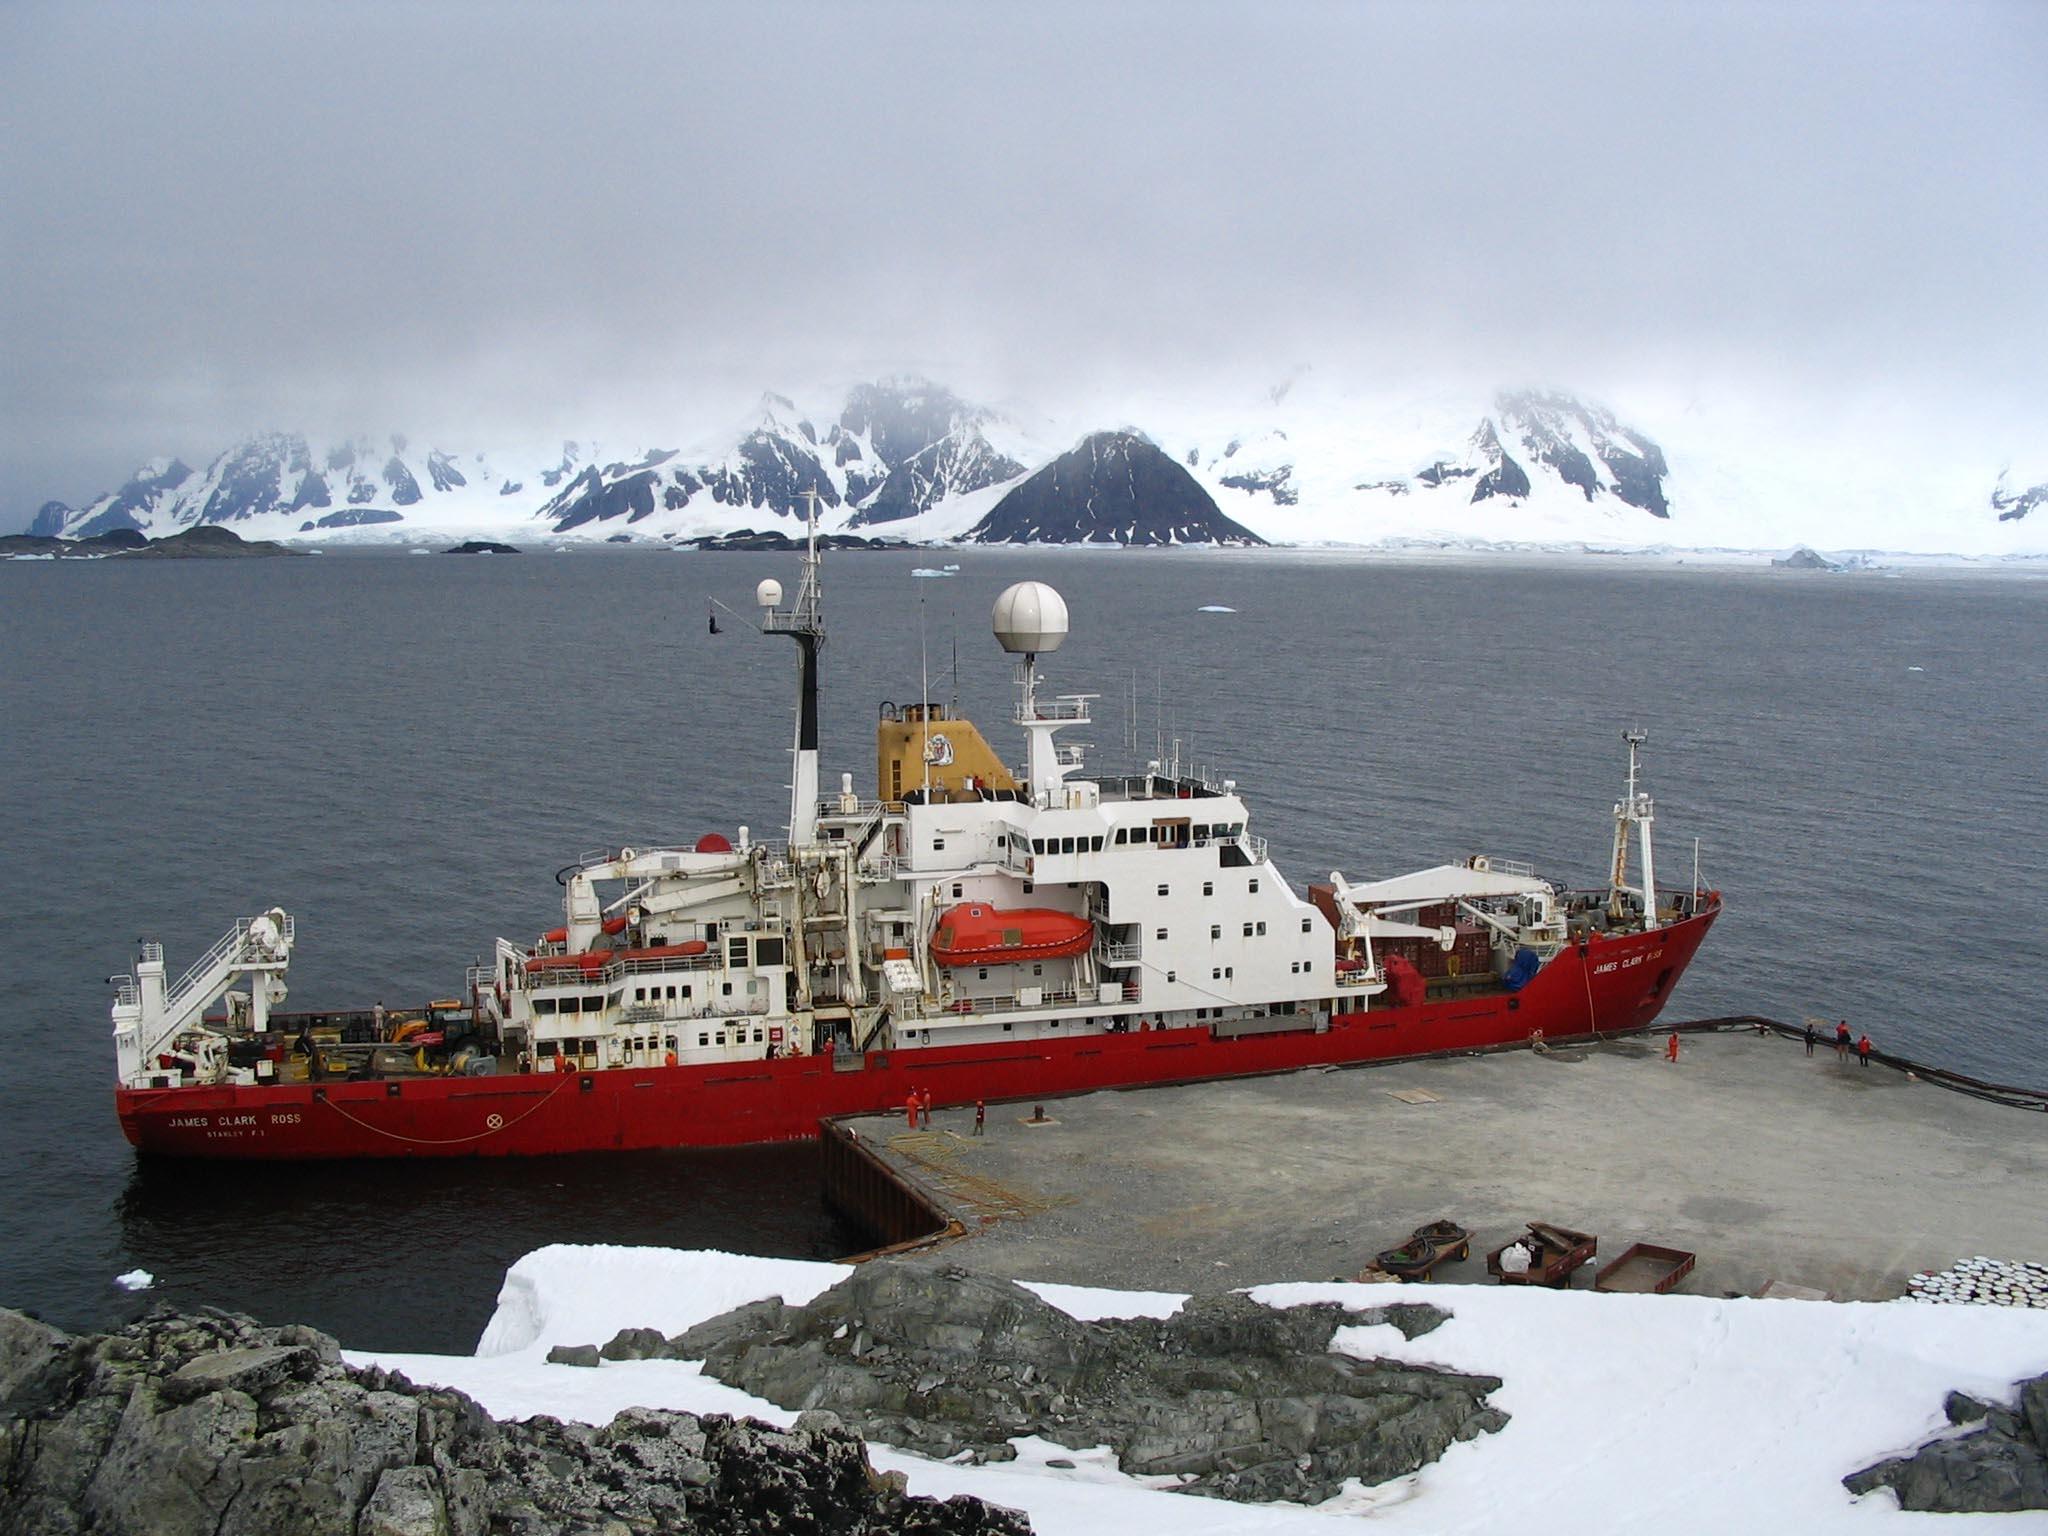 British Antarctic Survey's RRS James Clark Ross